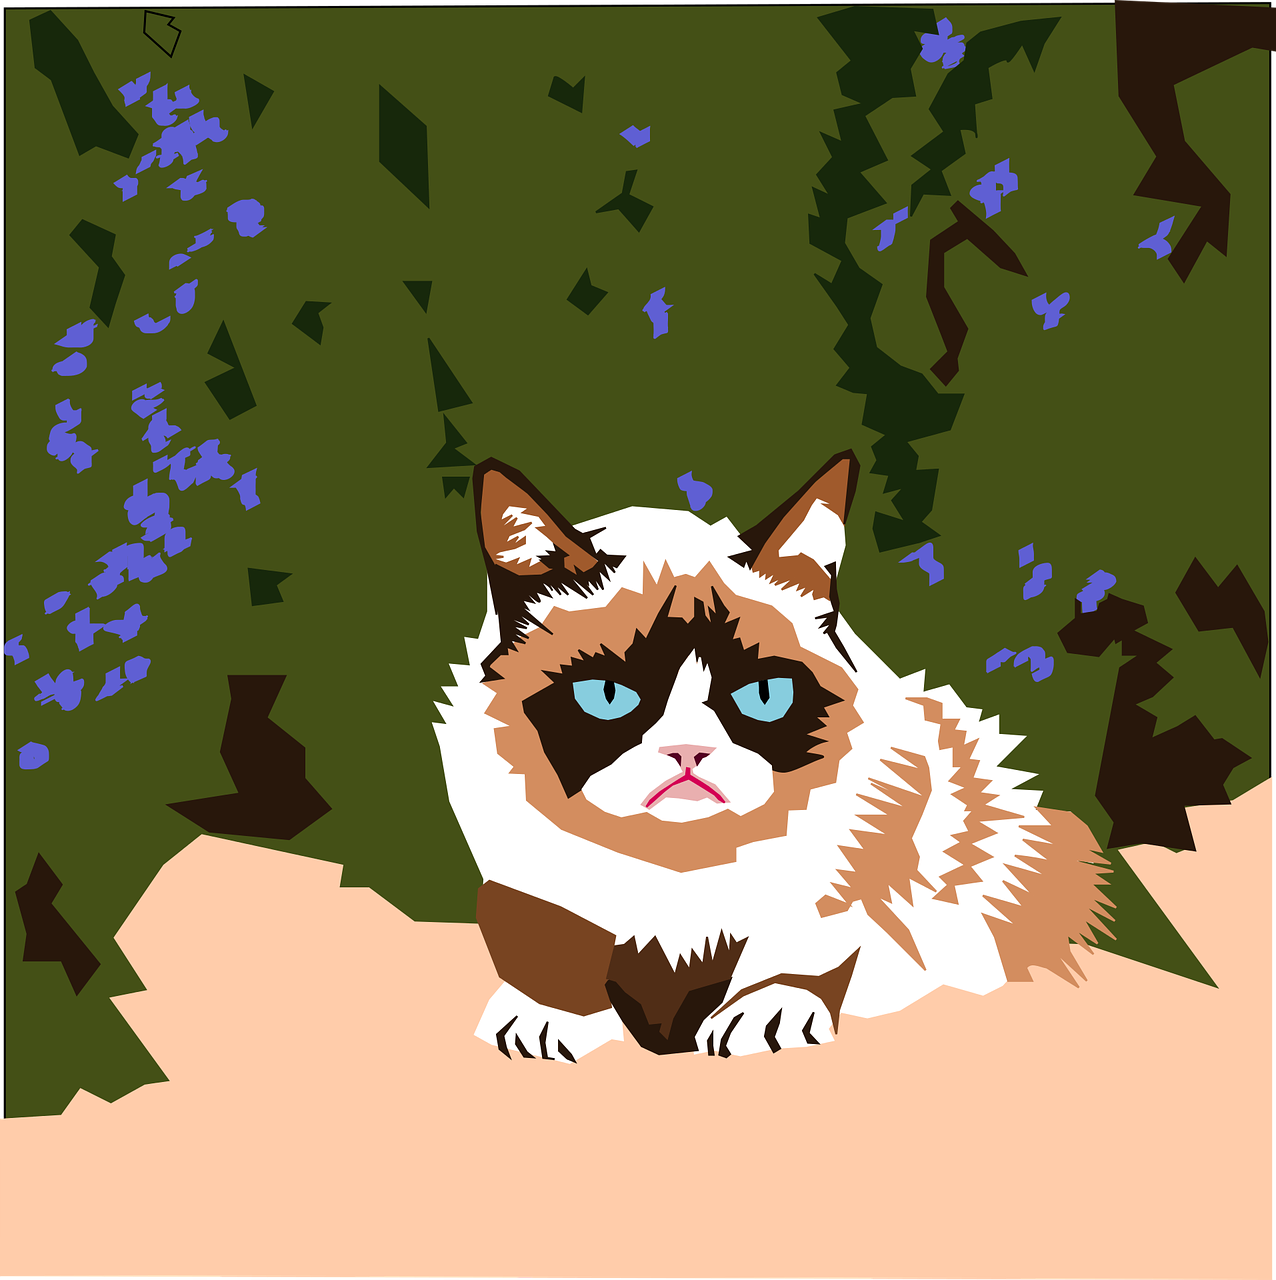 Gatos famosos en rede sociales